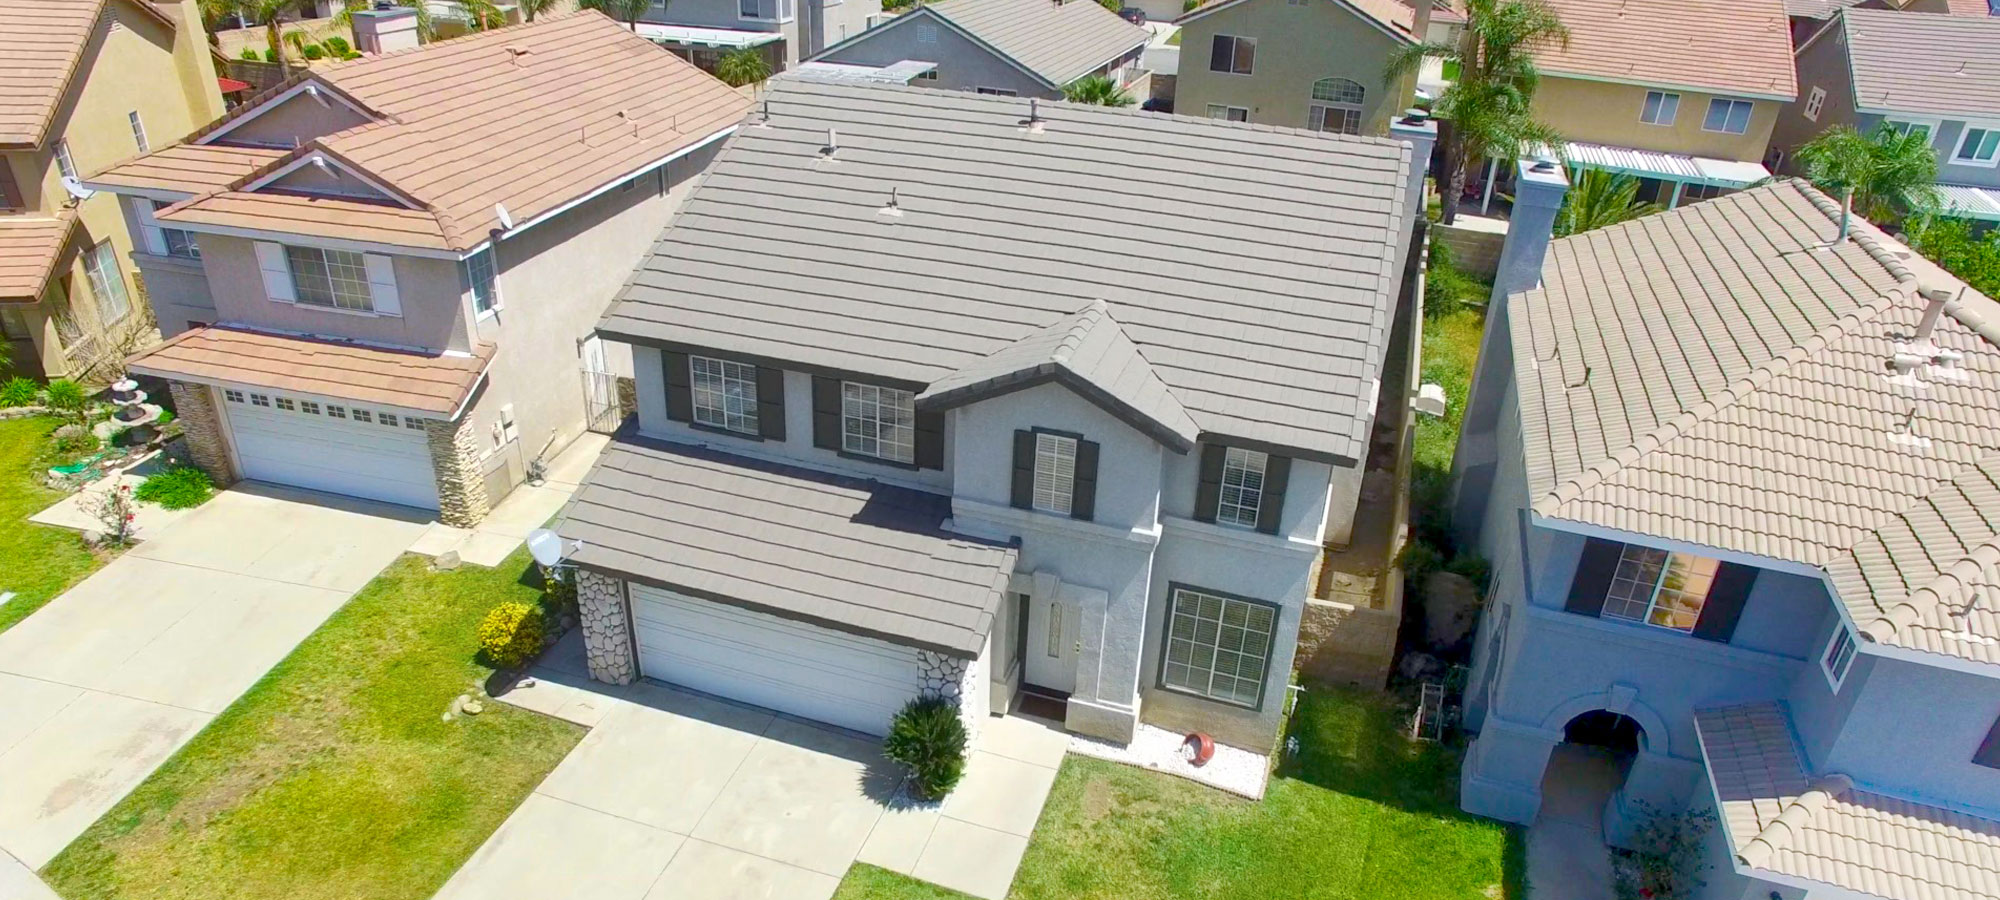 5377 Huntmaster Ln, Fontana, CA 92336